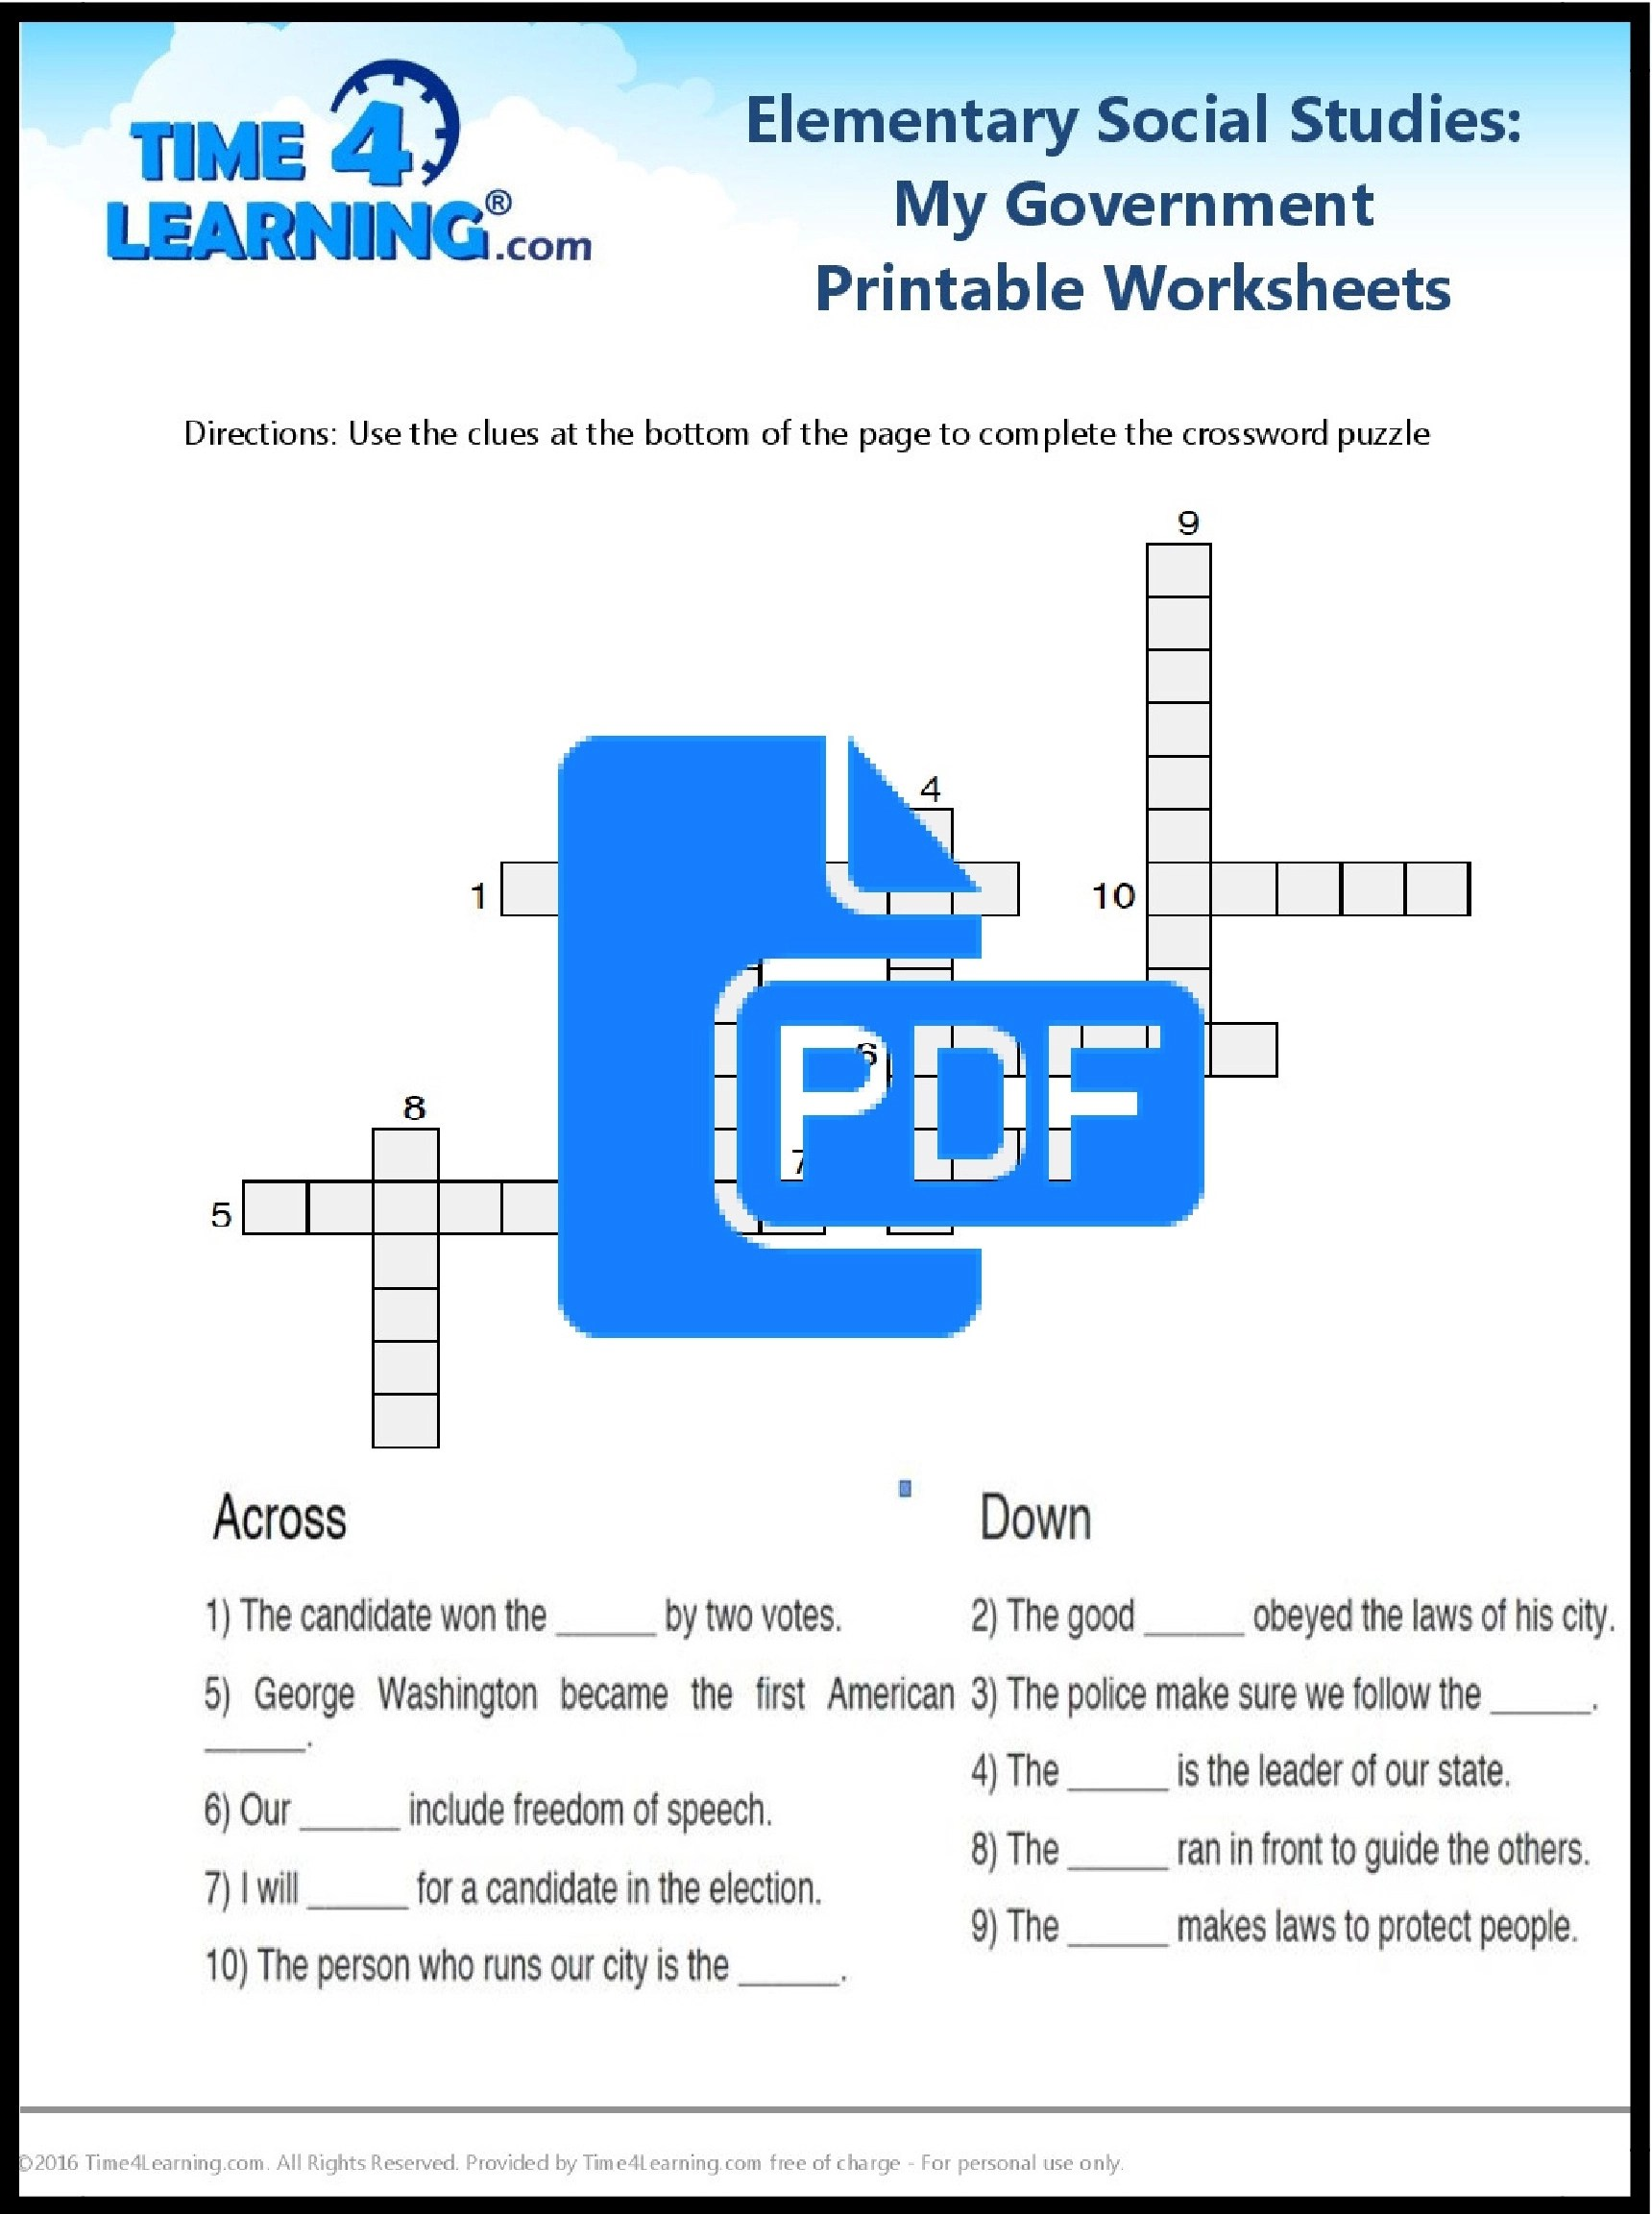 Worksheets Free 5th Grade Social Studies Worksheets 5th grade social studies worksheets free library pr t ble element ry ci l w ksheet time4le rn g